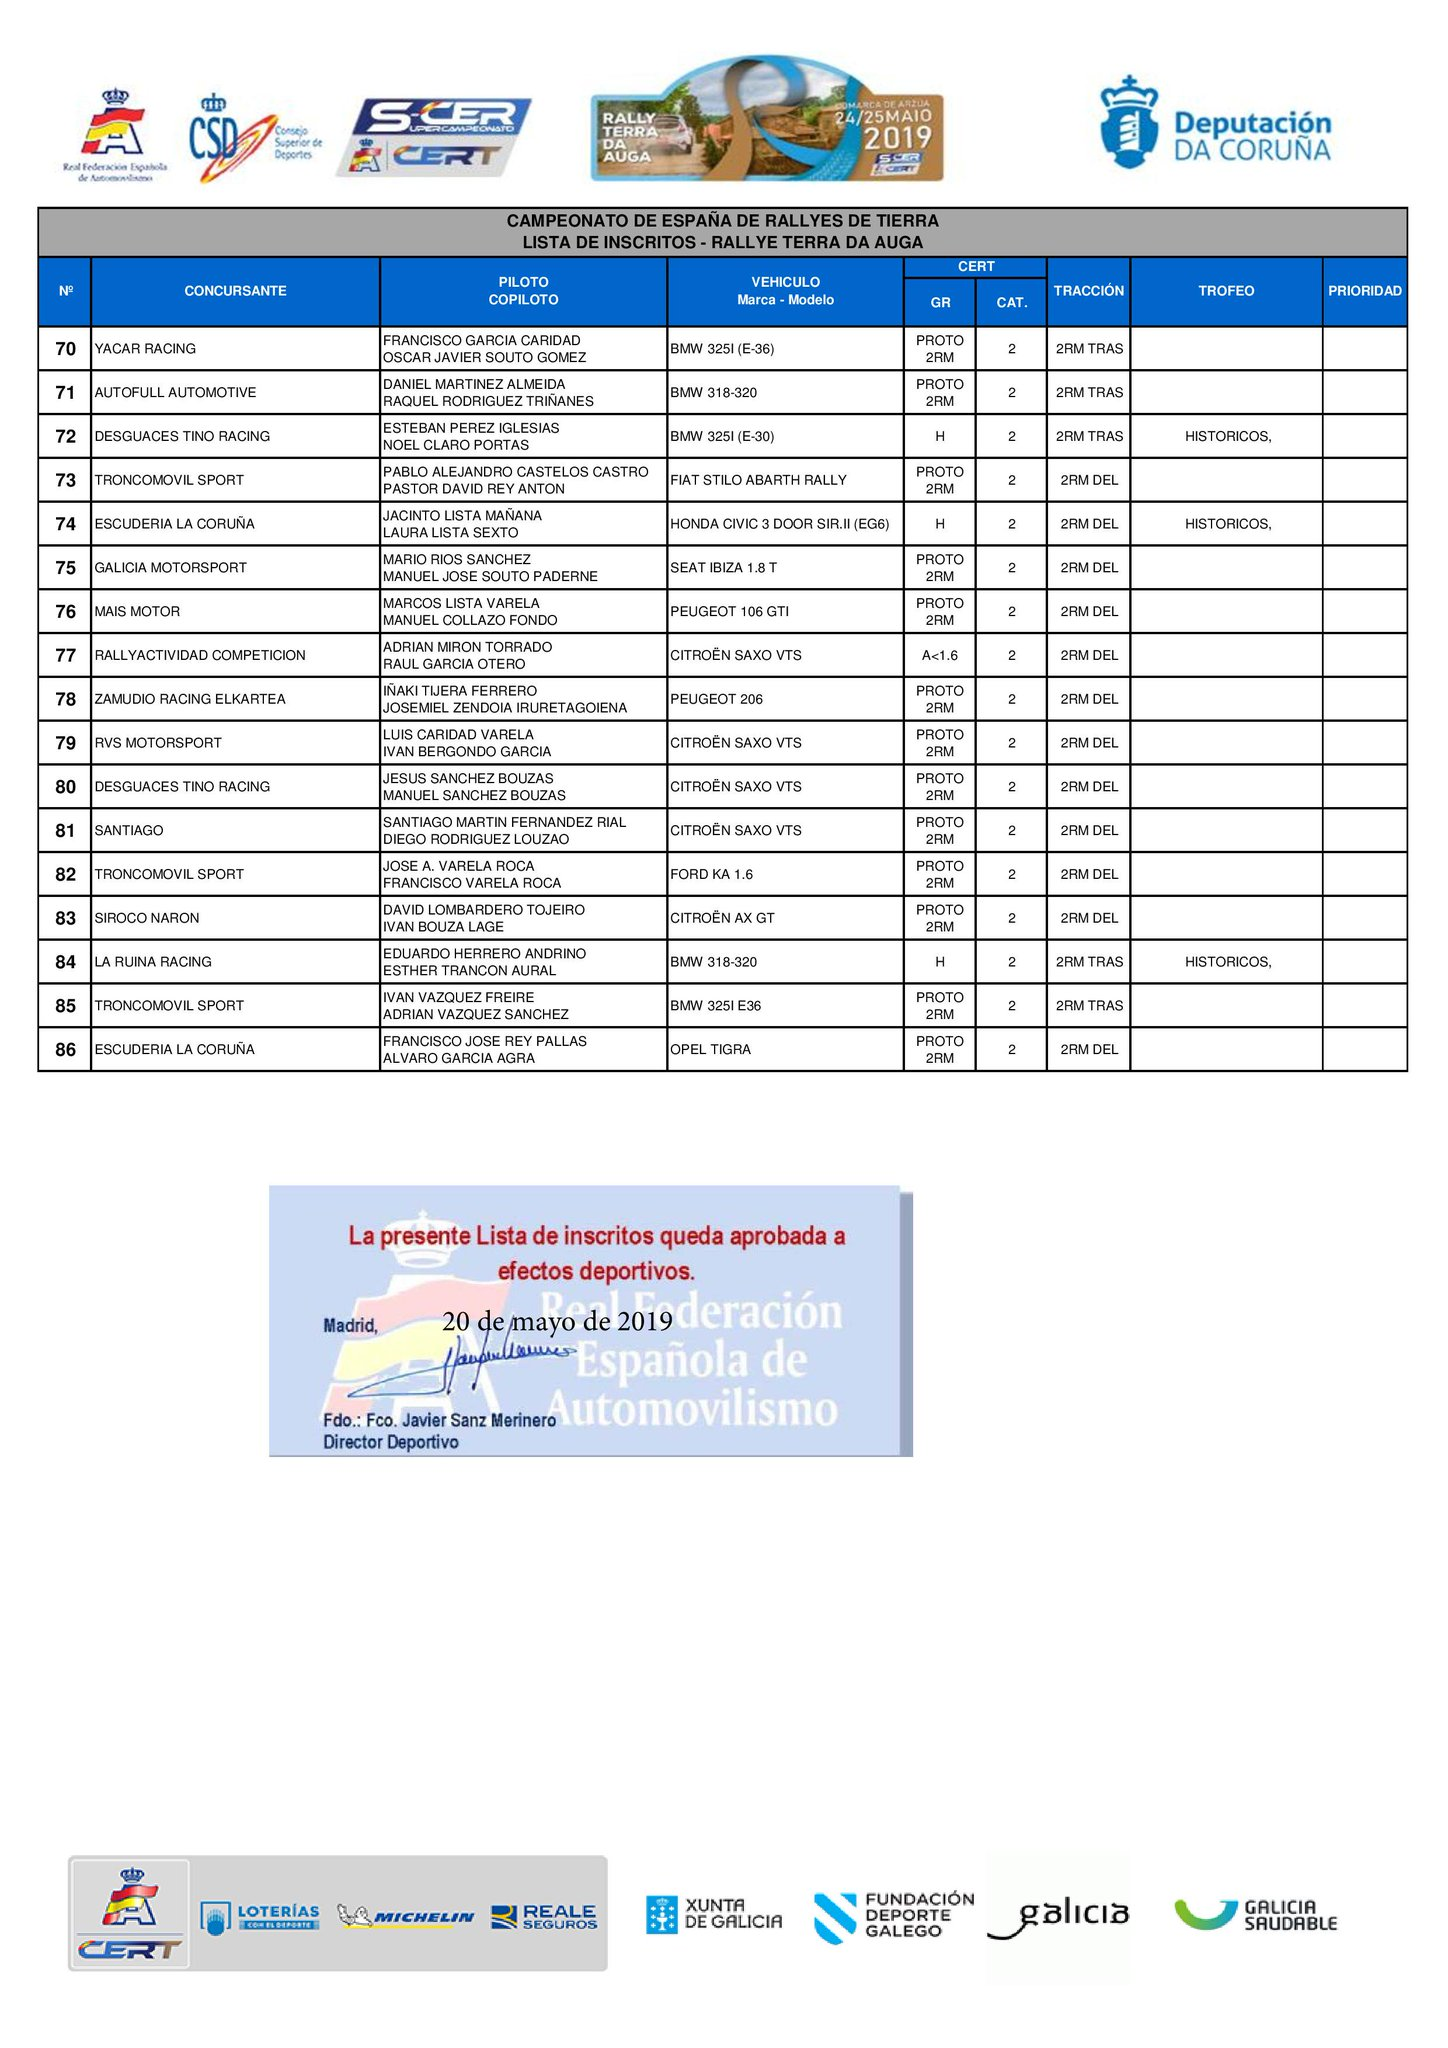 SCER + CERT: Rallye Terra da Auga - Comarca de Arzúa [24-25 Mayo] D7BGKG1XkAIWiEm